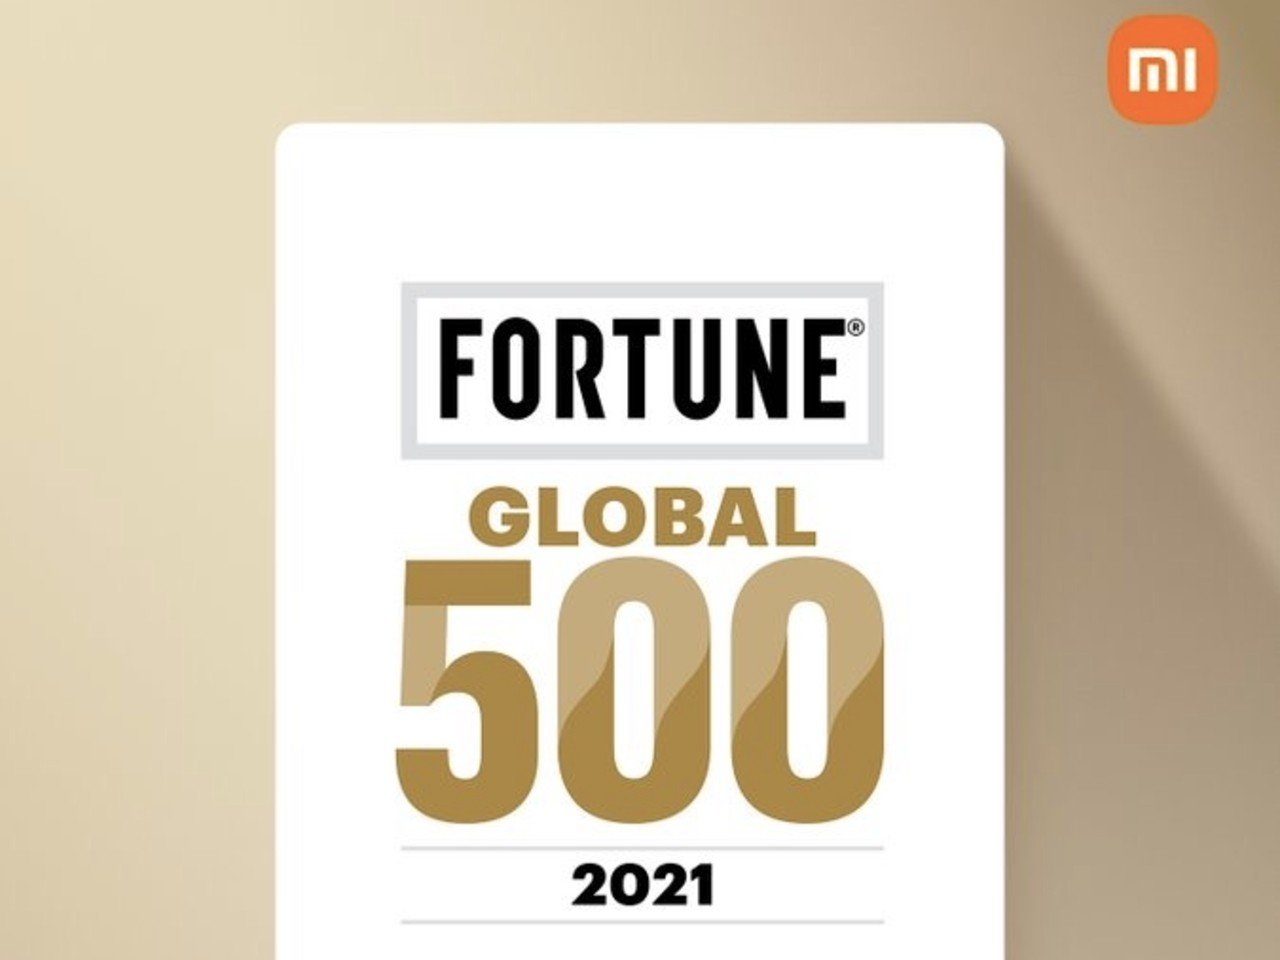 Xiaomi-Fortune-Global-500-Announcement-Feature